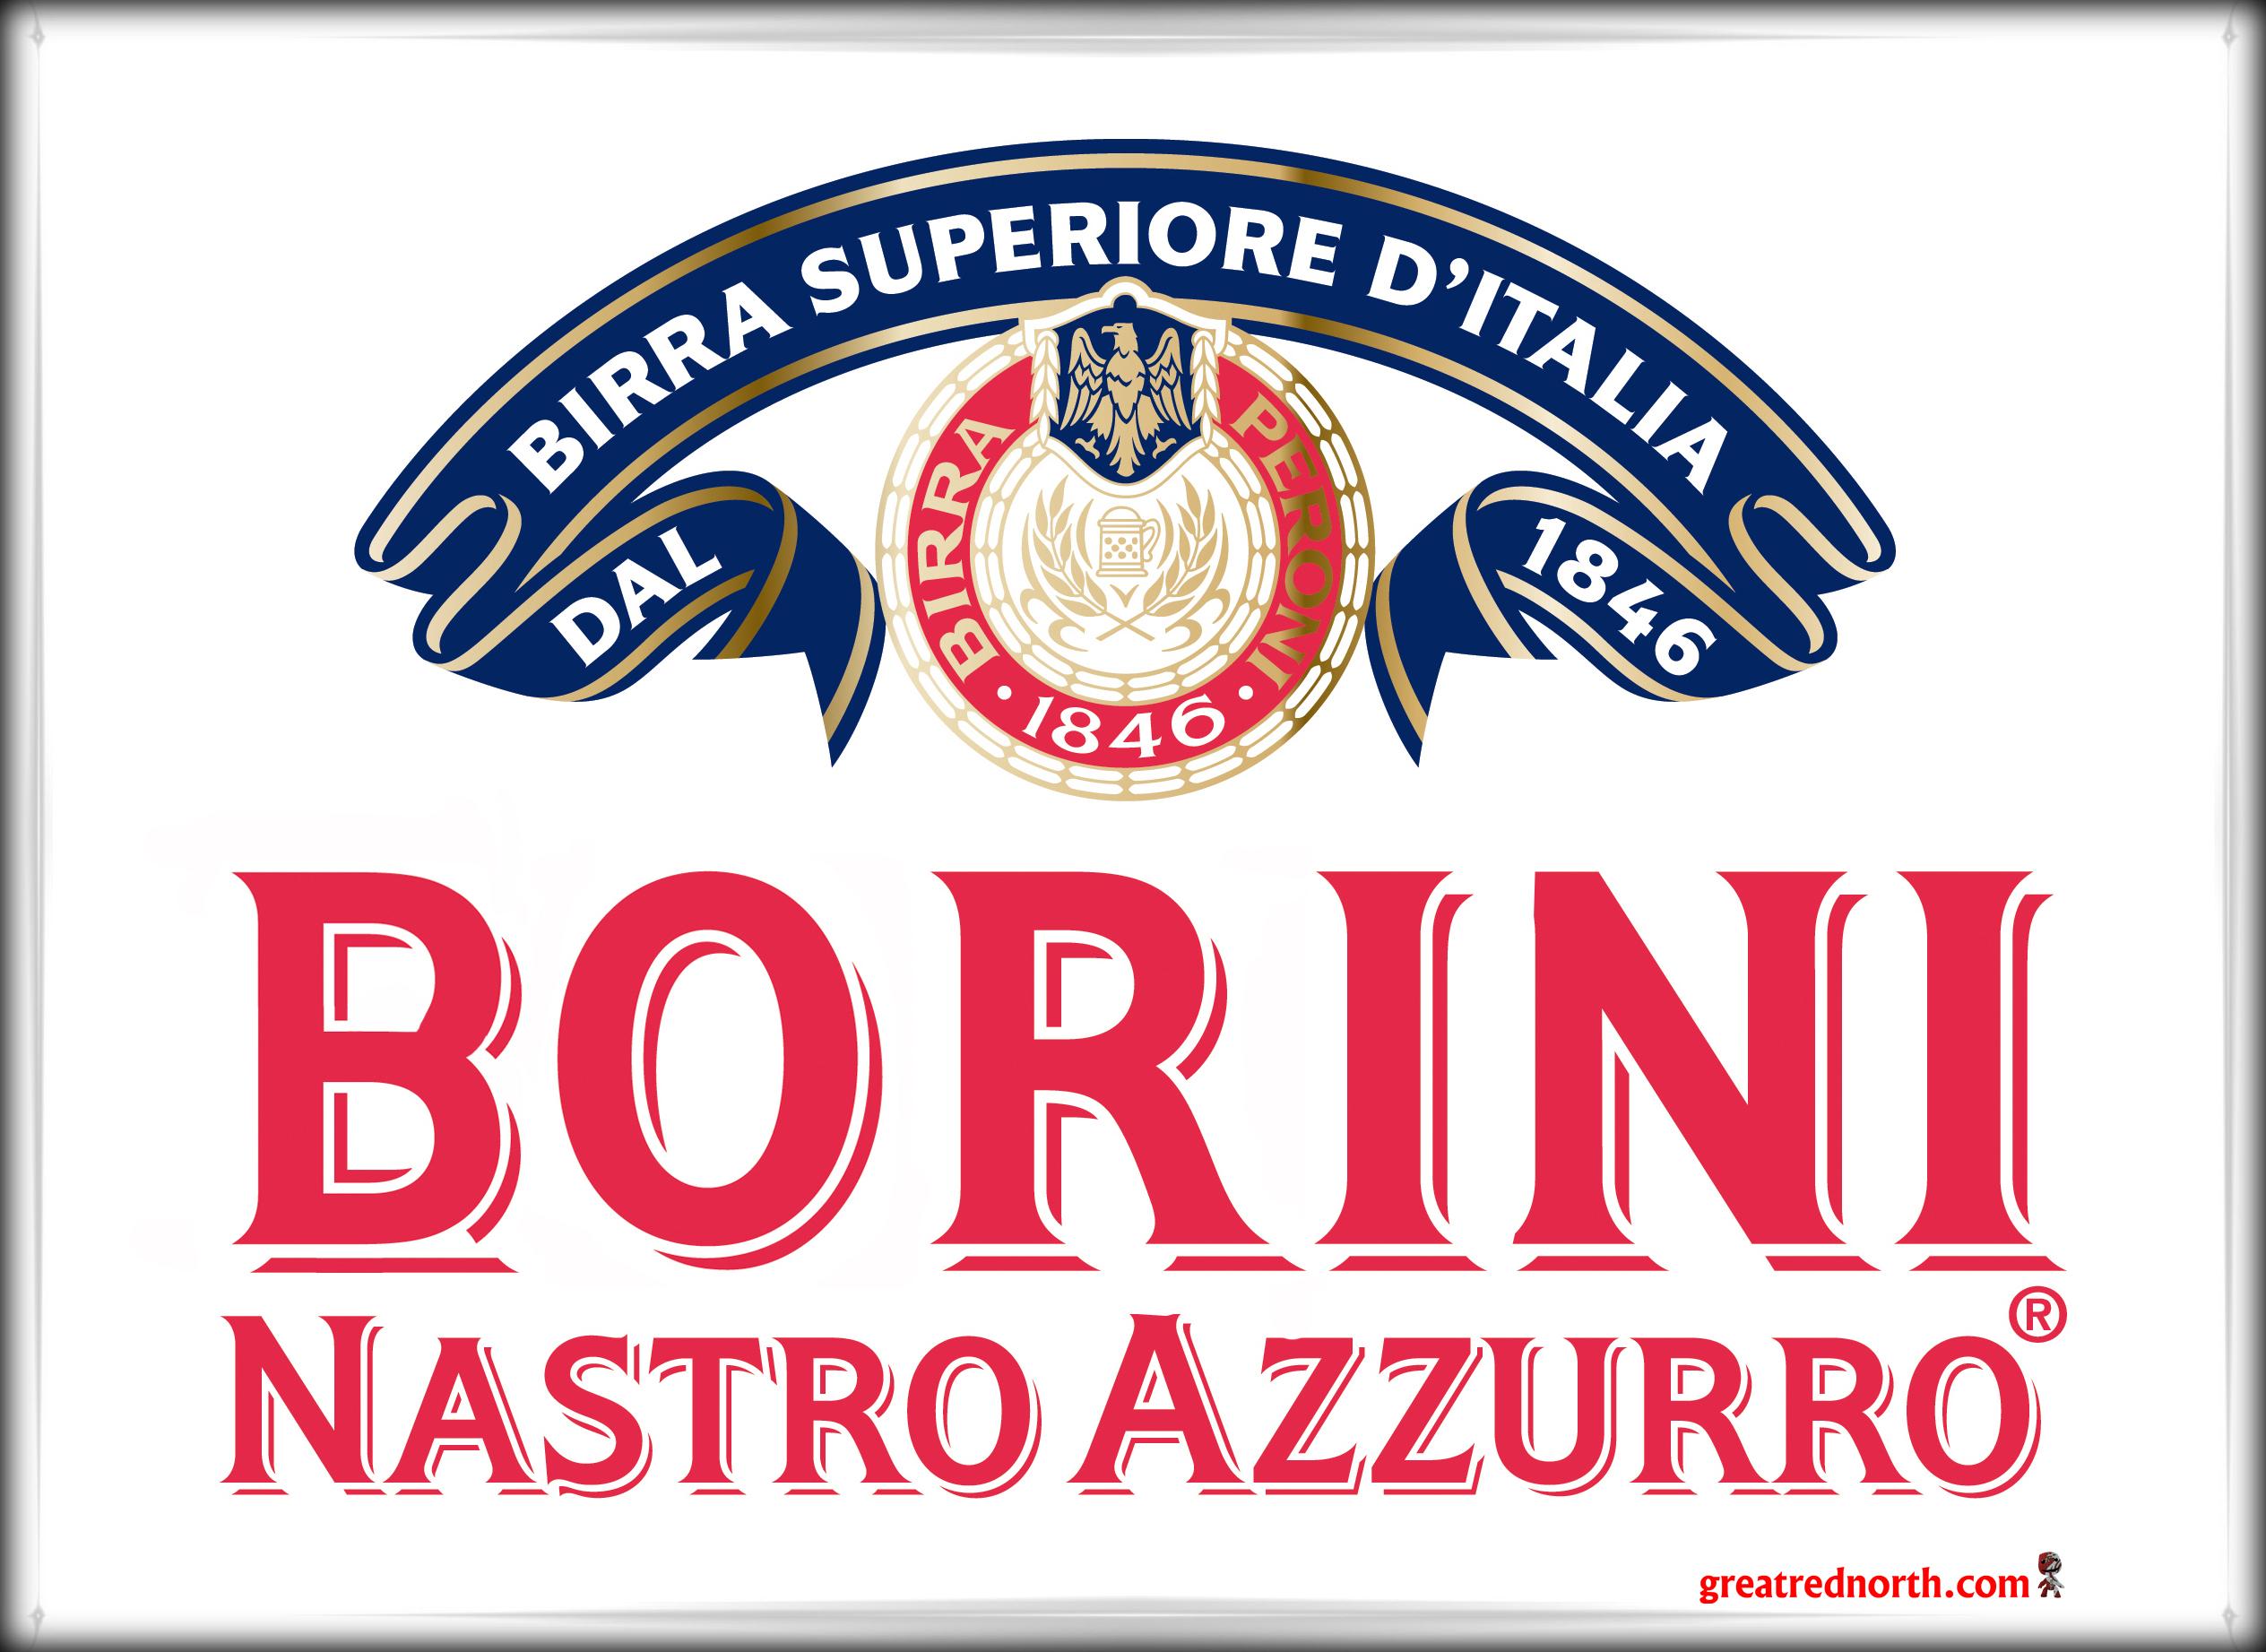 Borini Beerjpg